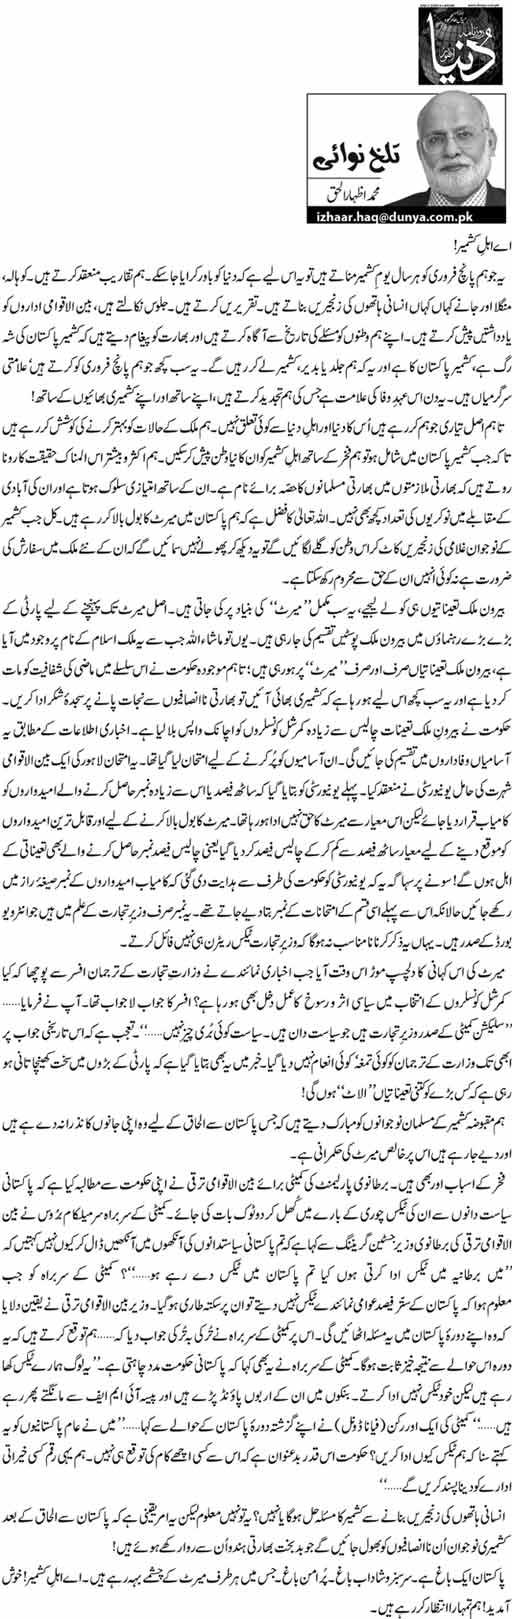 Aye ahle Kashmir! - M. Izhar ul Haq